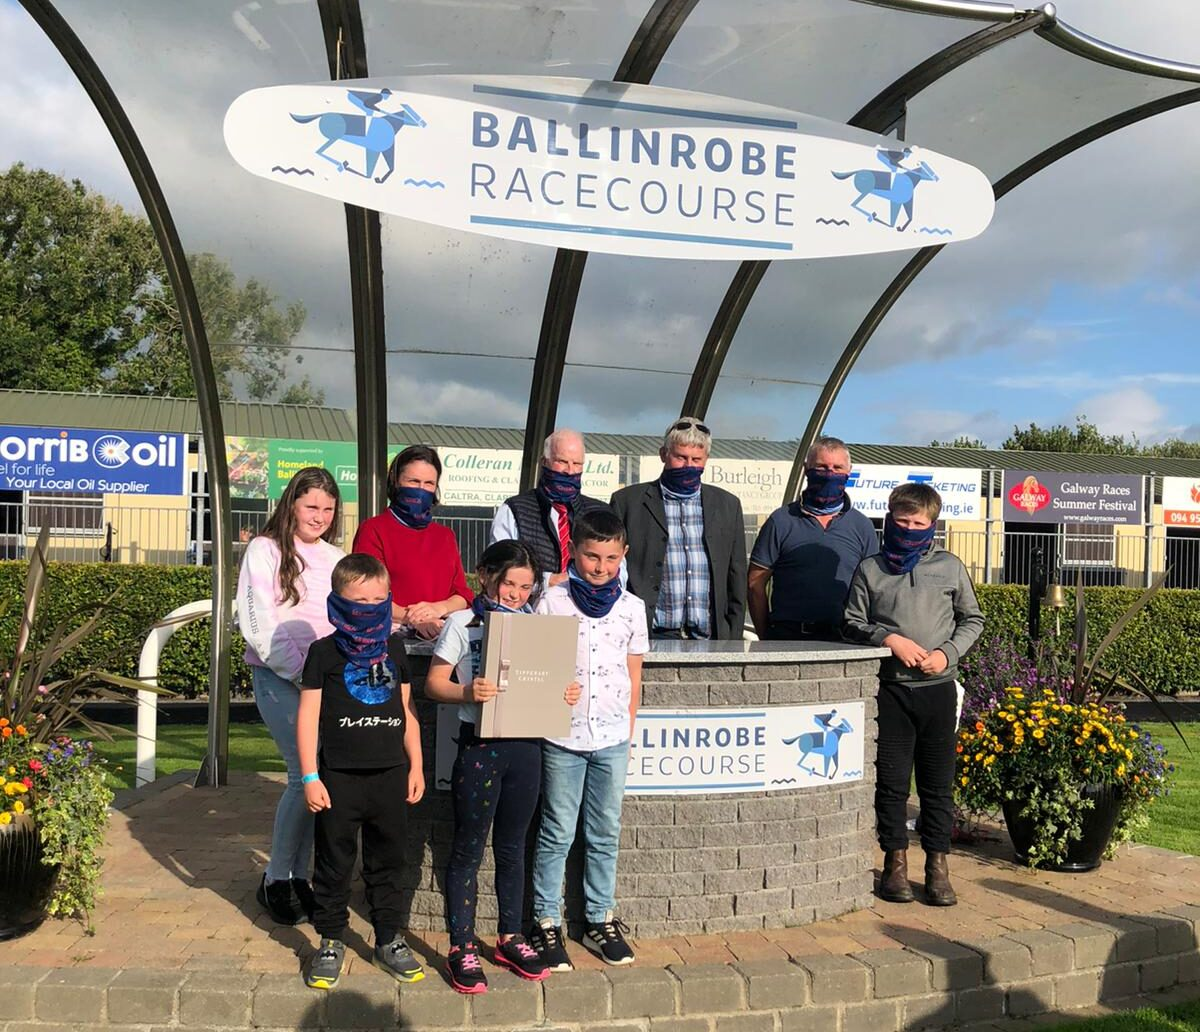 Double incentive bonus for Red Mills Irish EBF Auction Hurdle winner at Ballinrobe